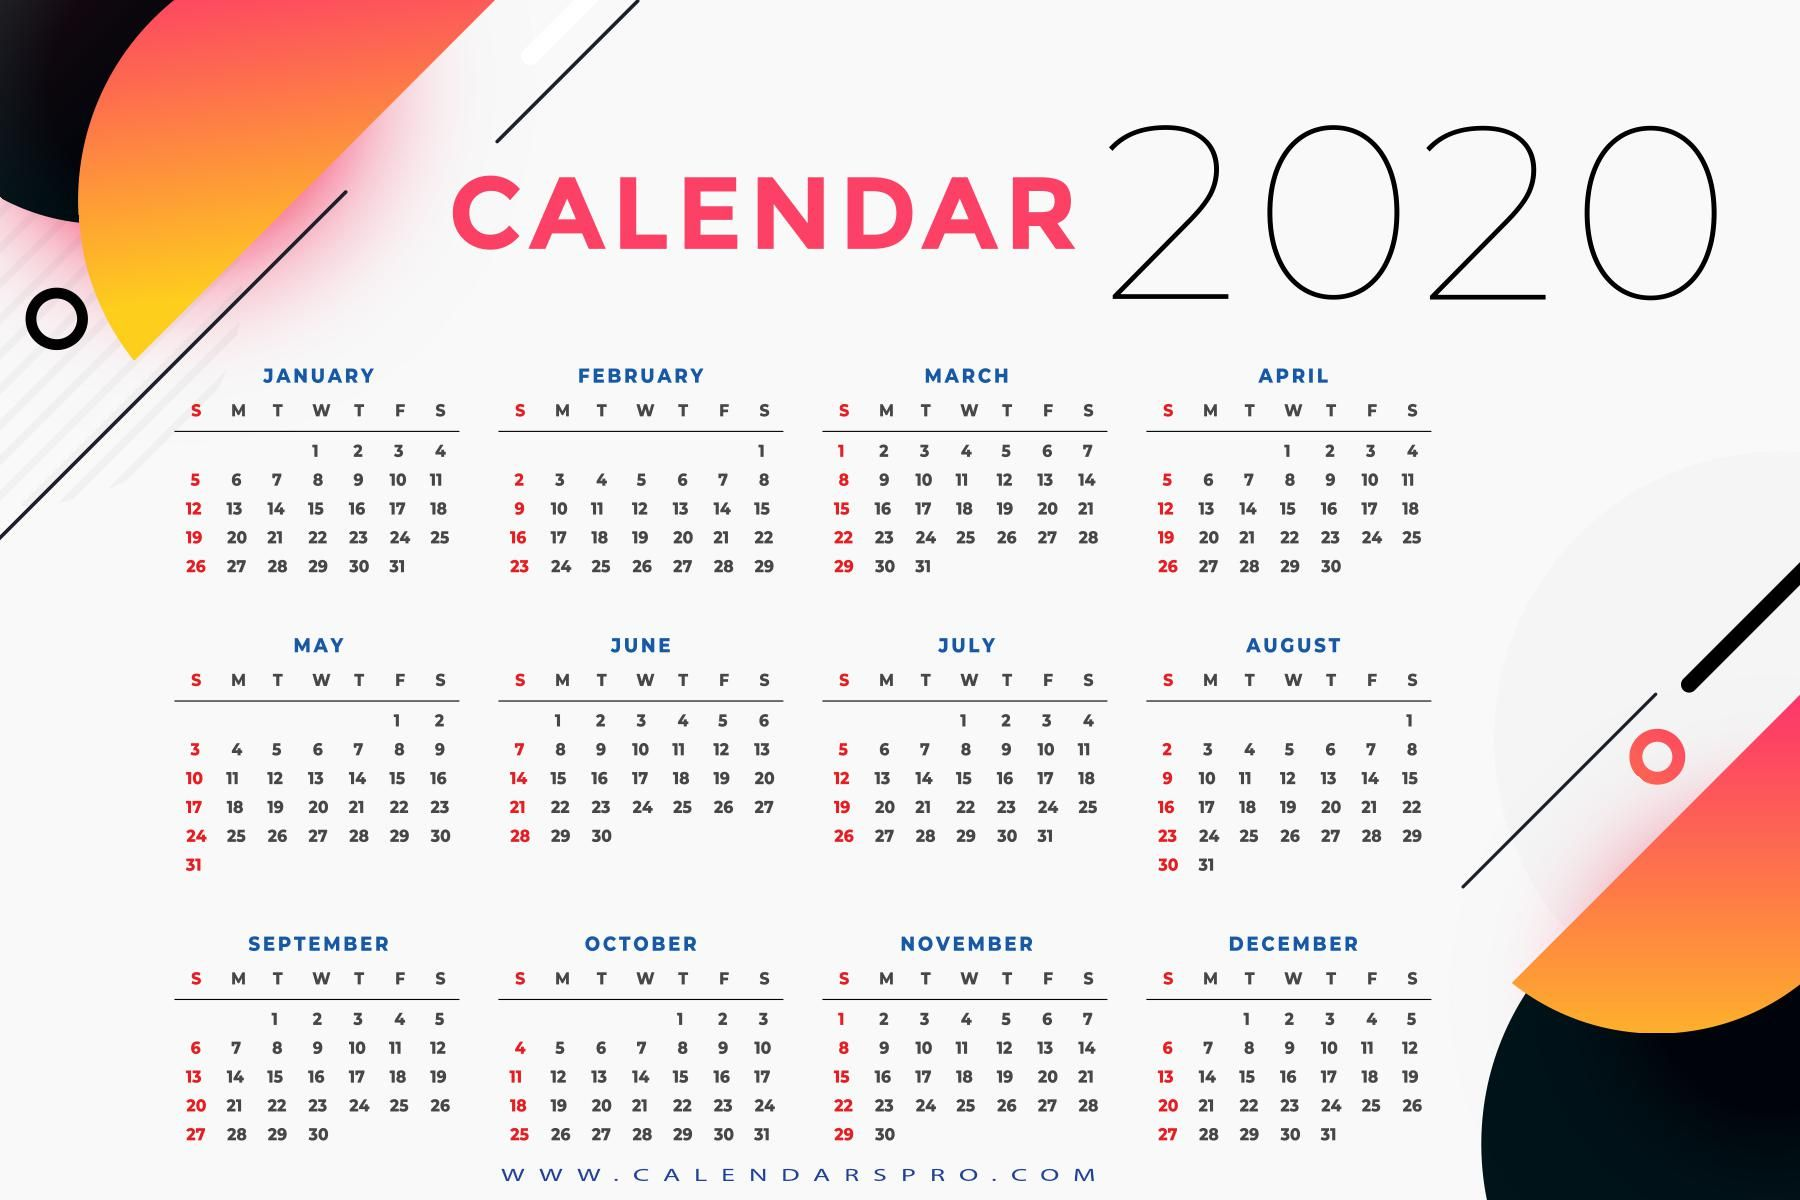 diwali 2020 date, onam 2020, guru purnima, dussehra 2020